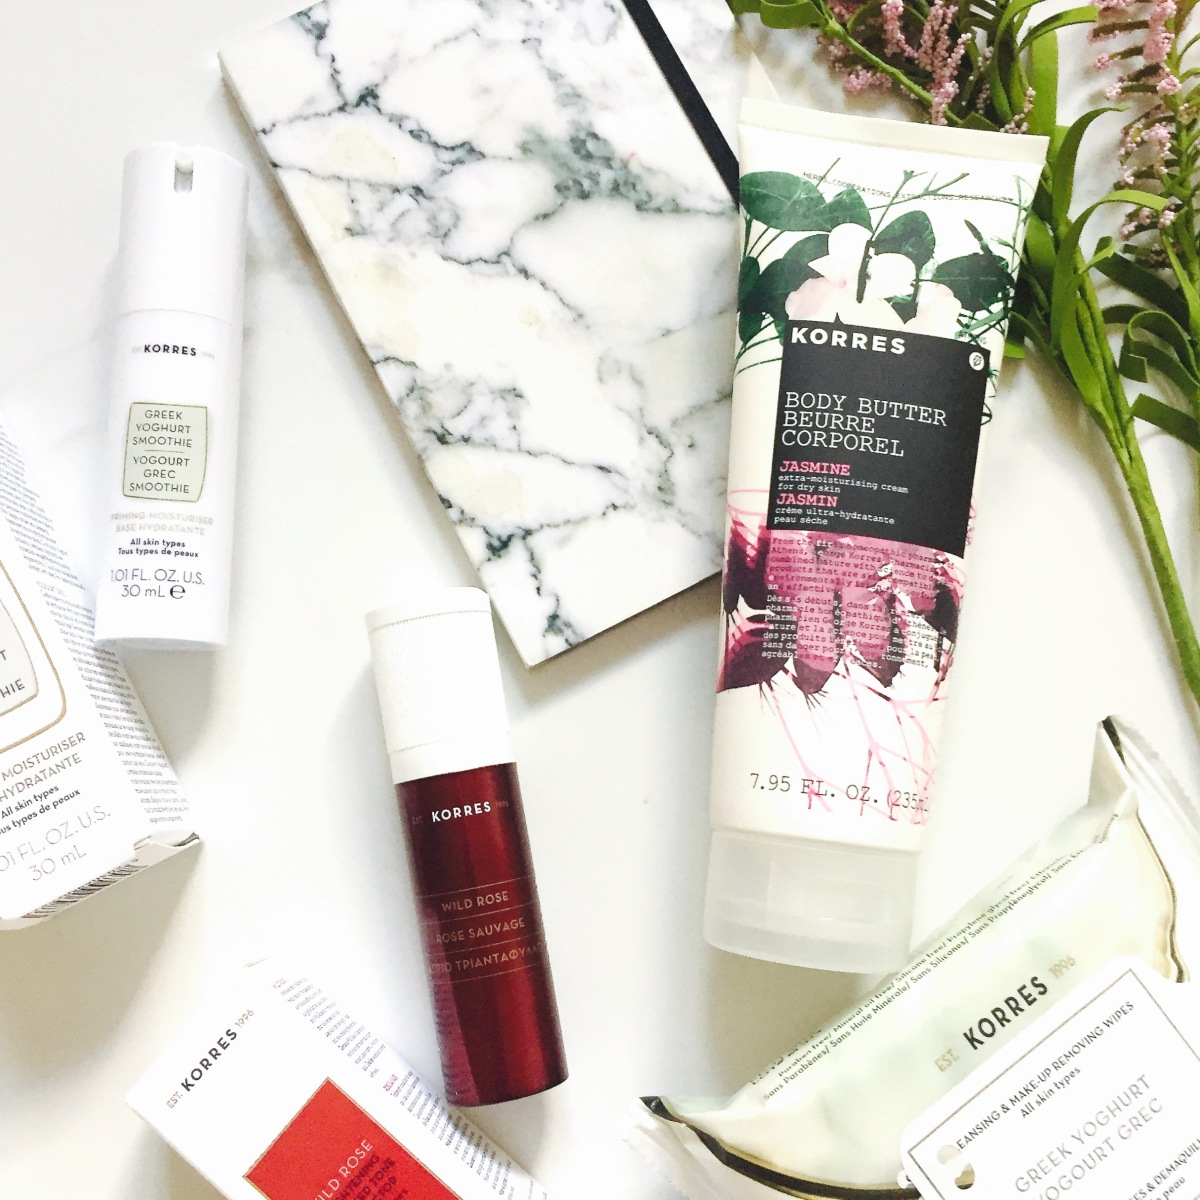 Brand Overview - Korres - Skincare